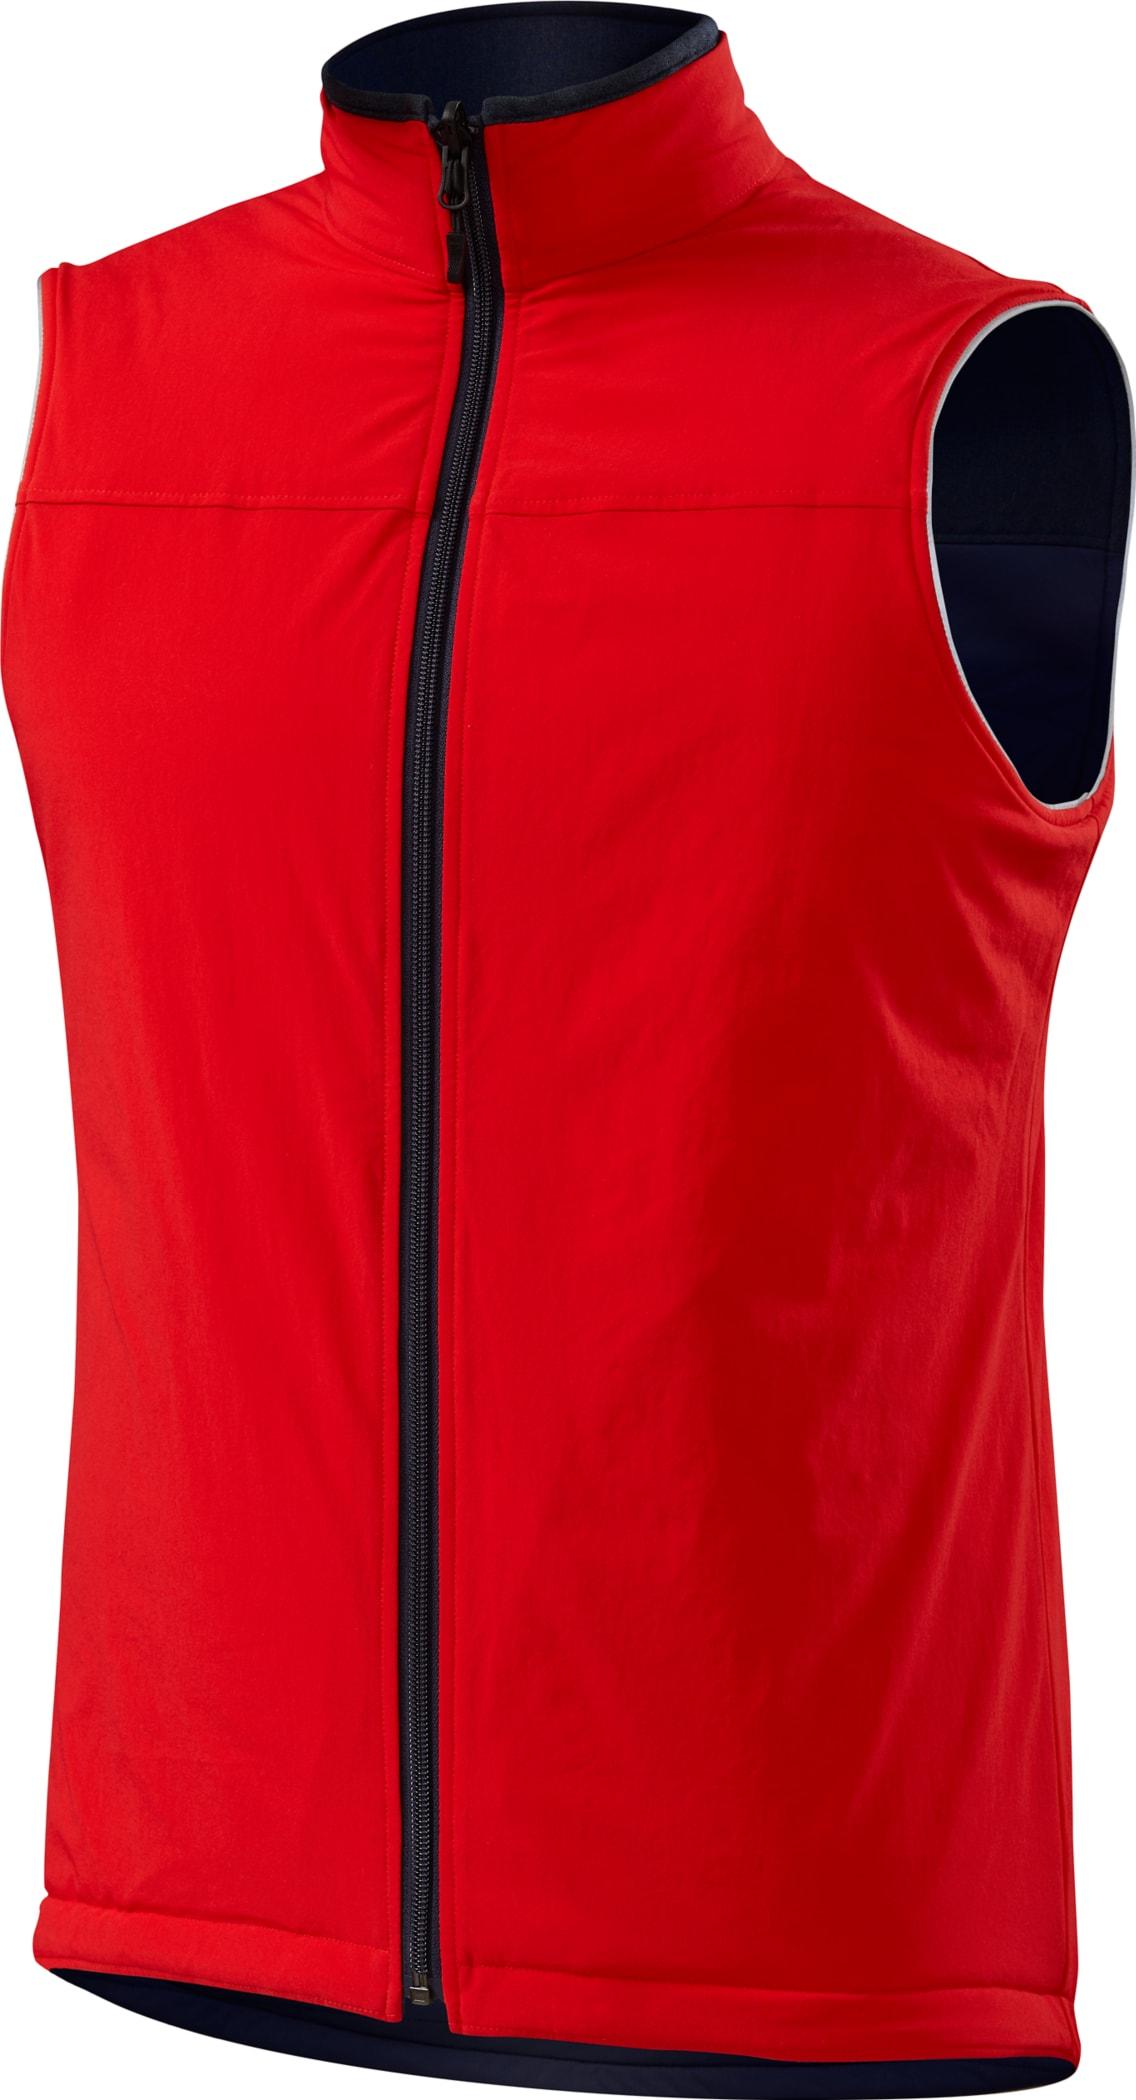 Specialized Väst, Utility Reversible Vest, Navy/Red